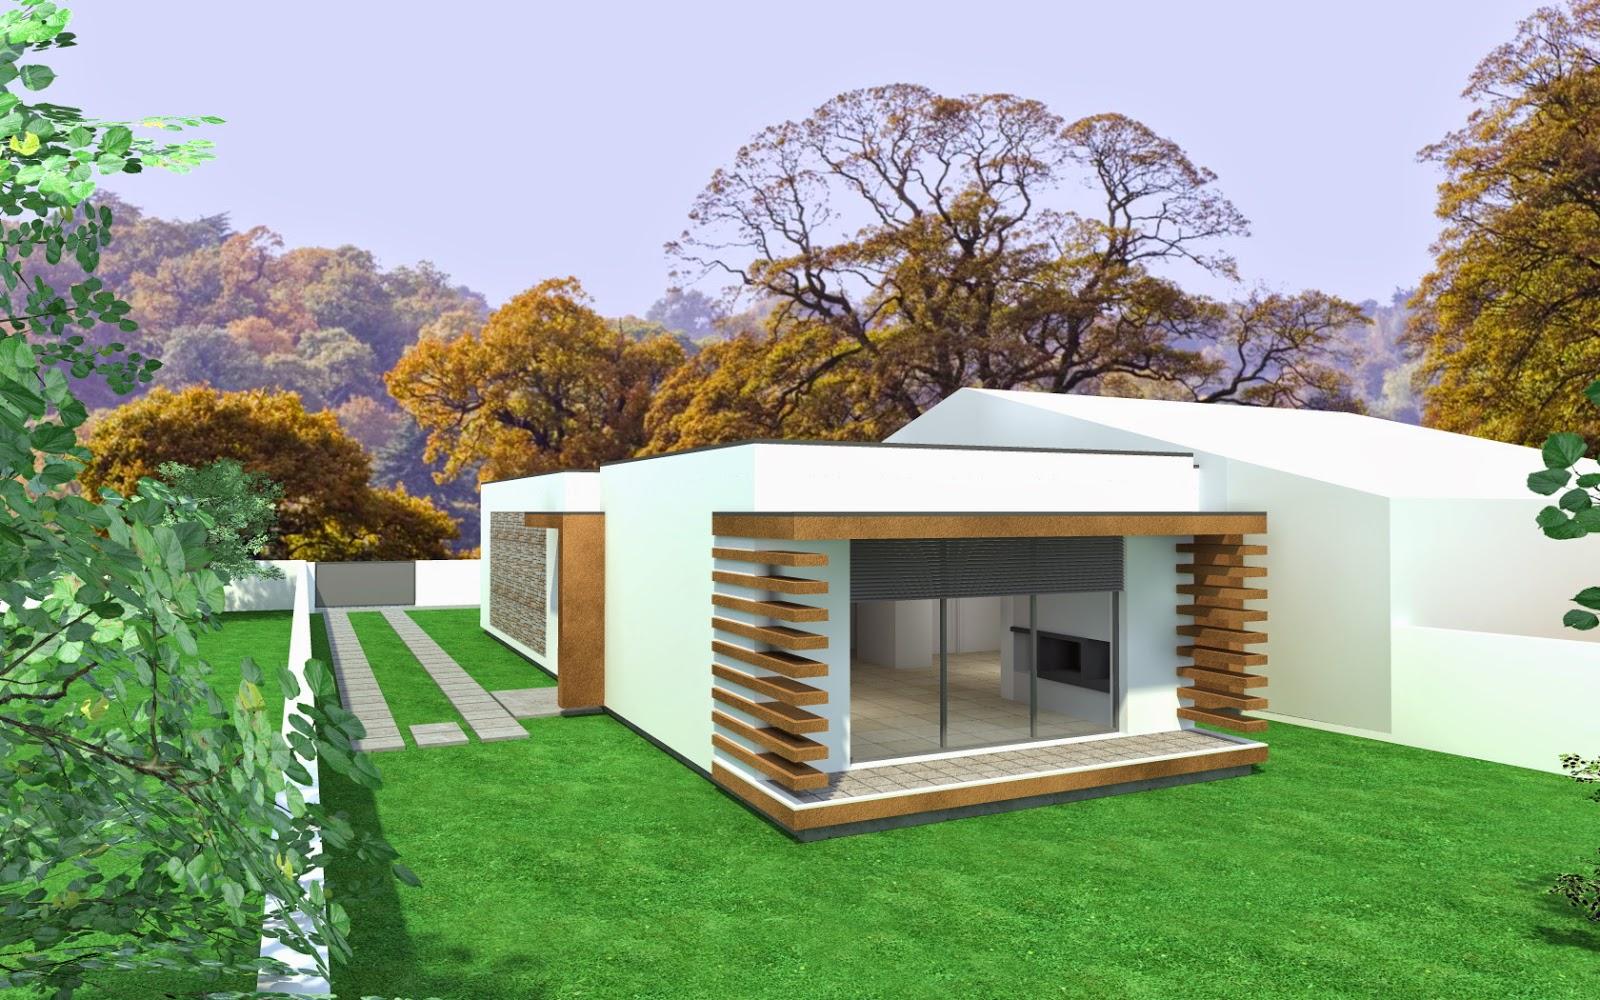 Casas modulares steel houses steel houses silvalde - Casas modulares portugal ...